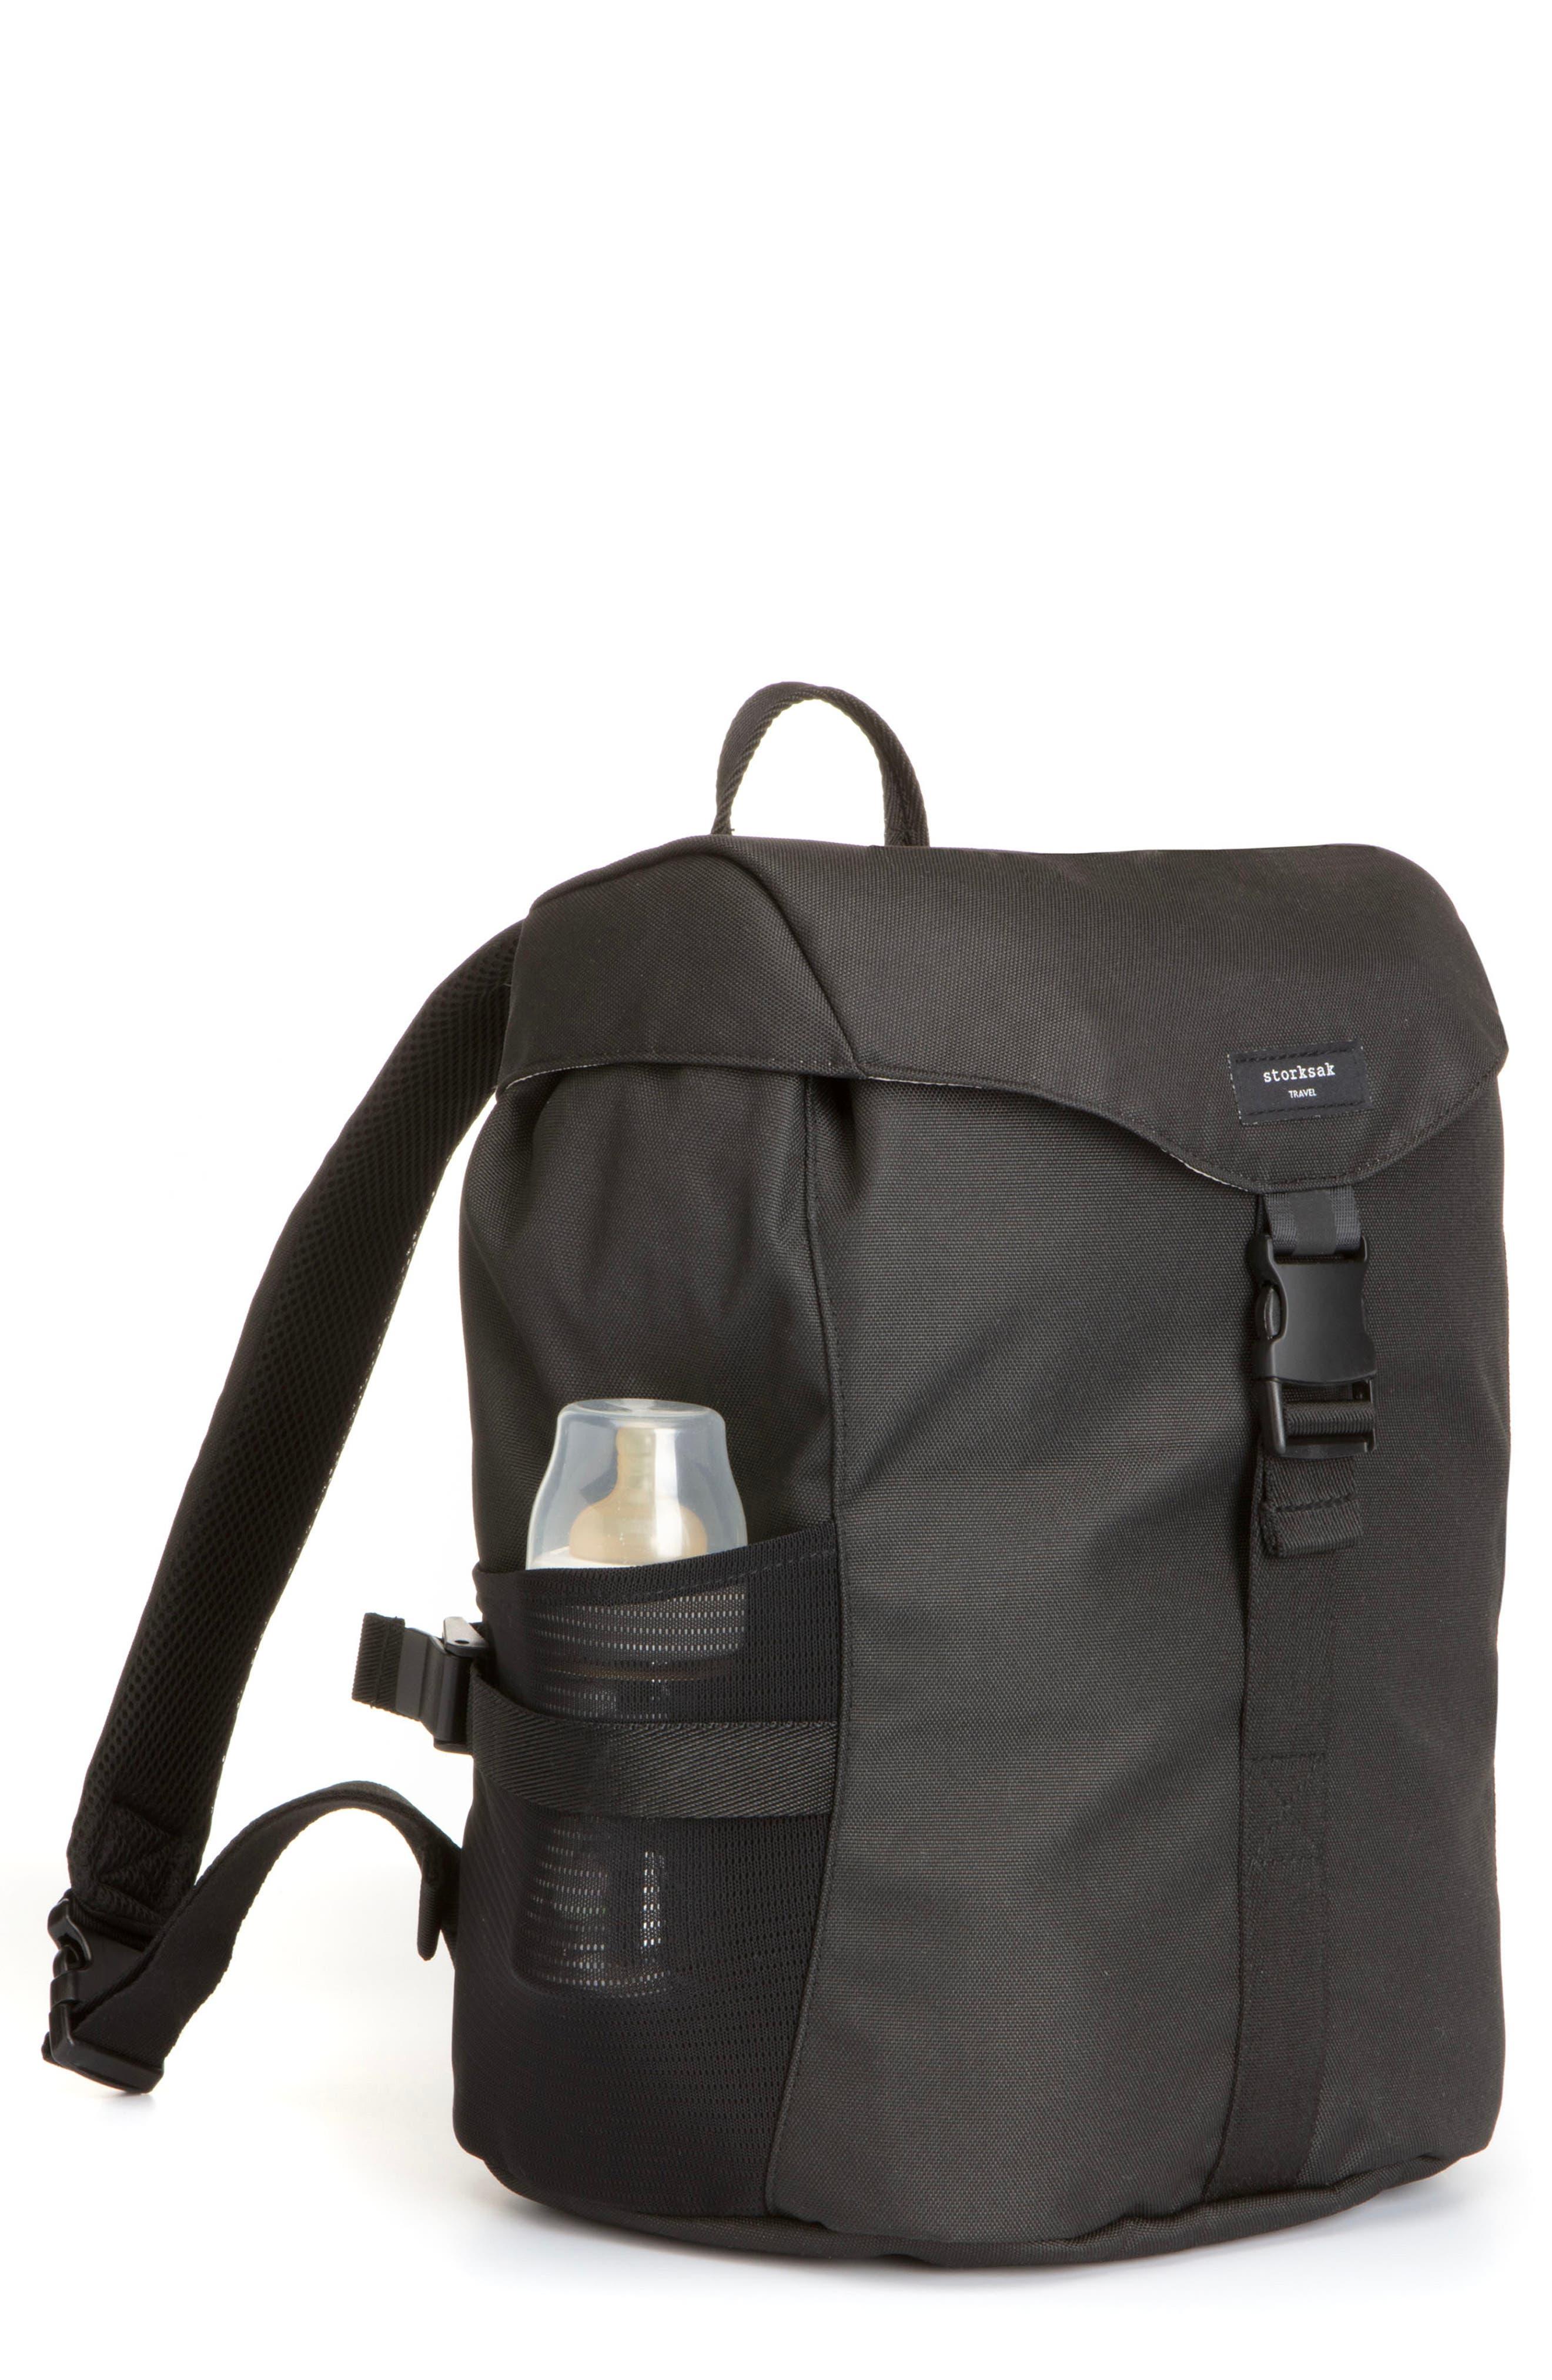 Frankie Valli Novel And Stylish Black Backpack Travel Computer Bag